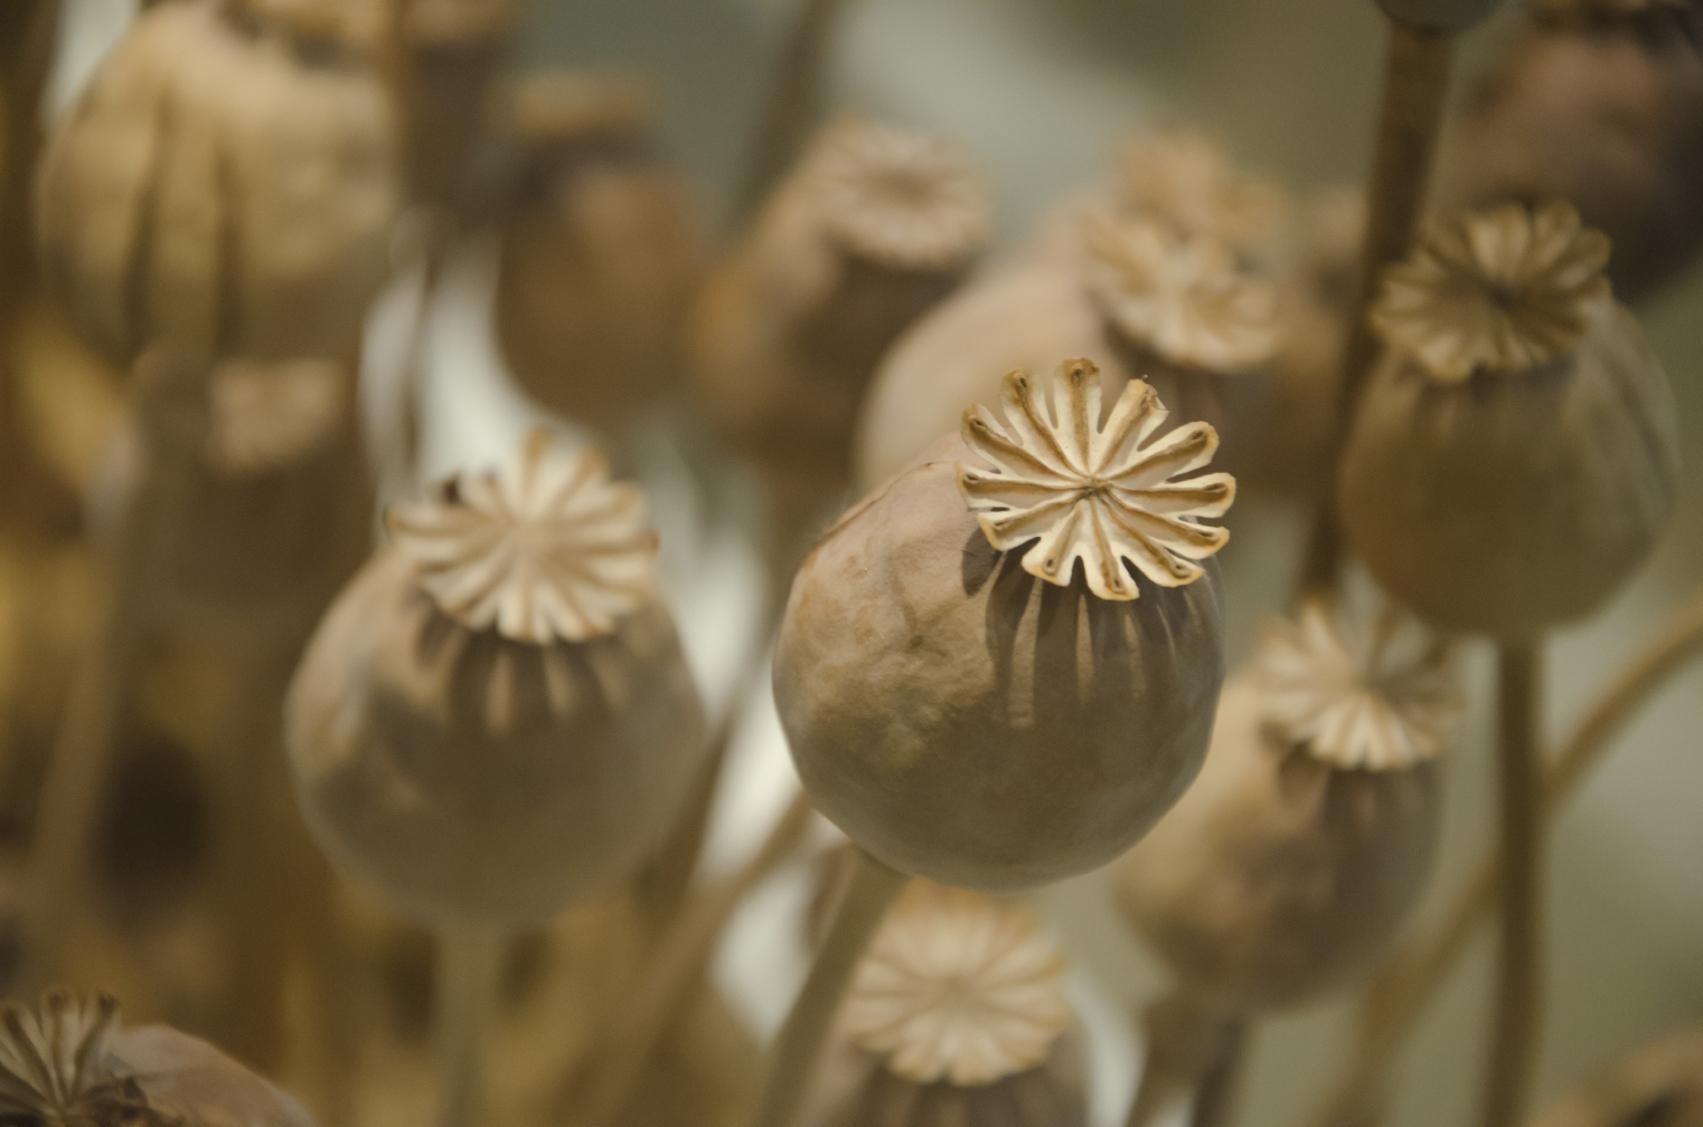 Opium poppy pods, source of the crude drug opium. (nakornkhai/iStock)